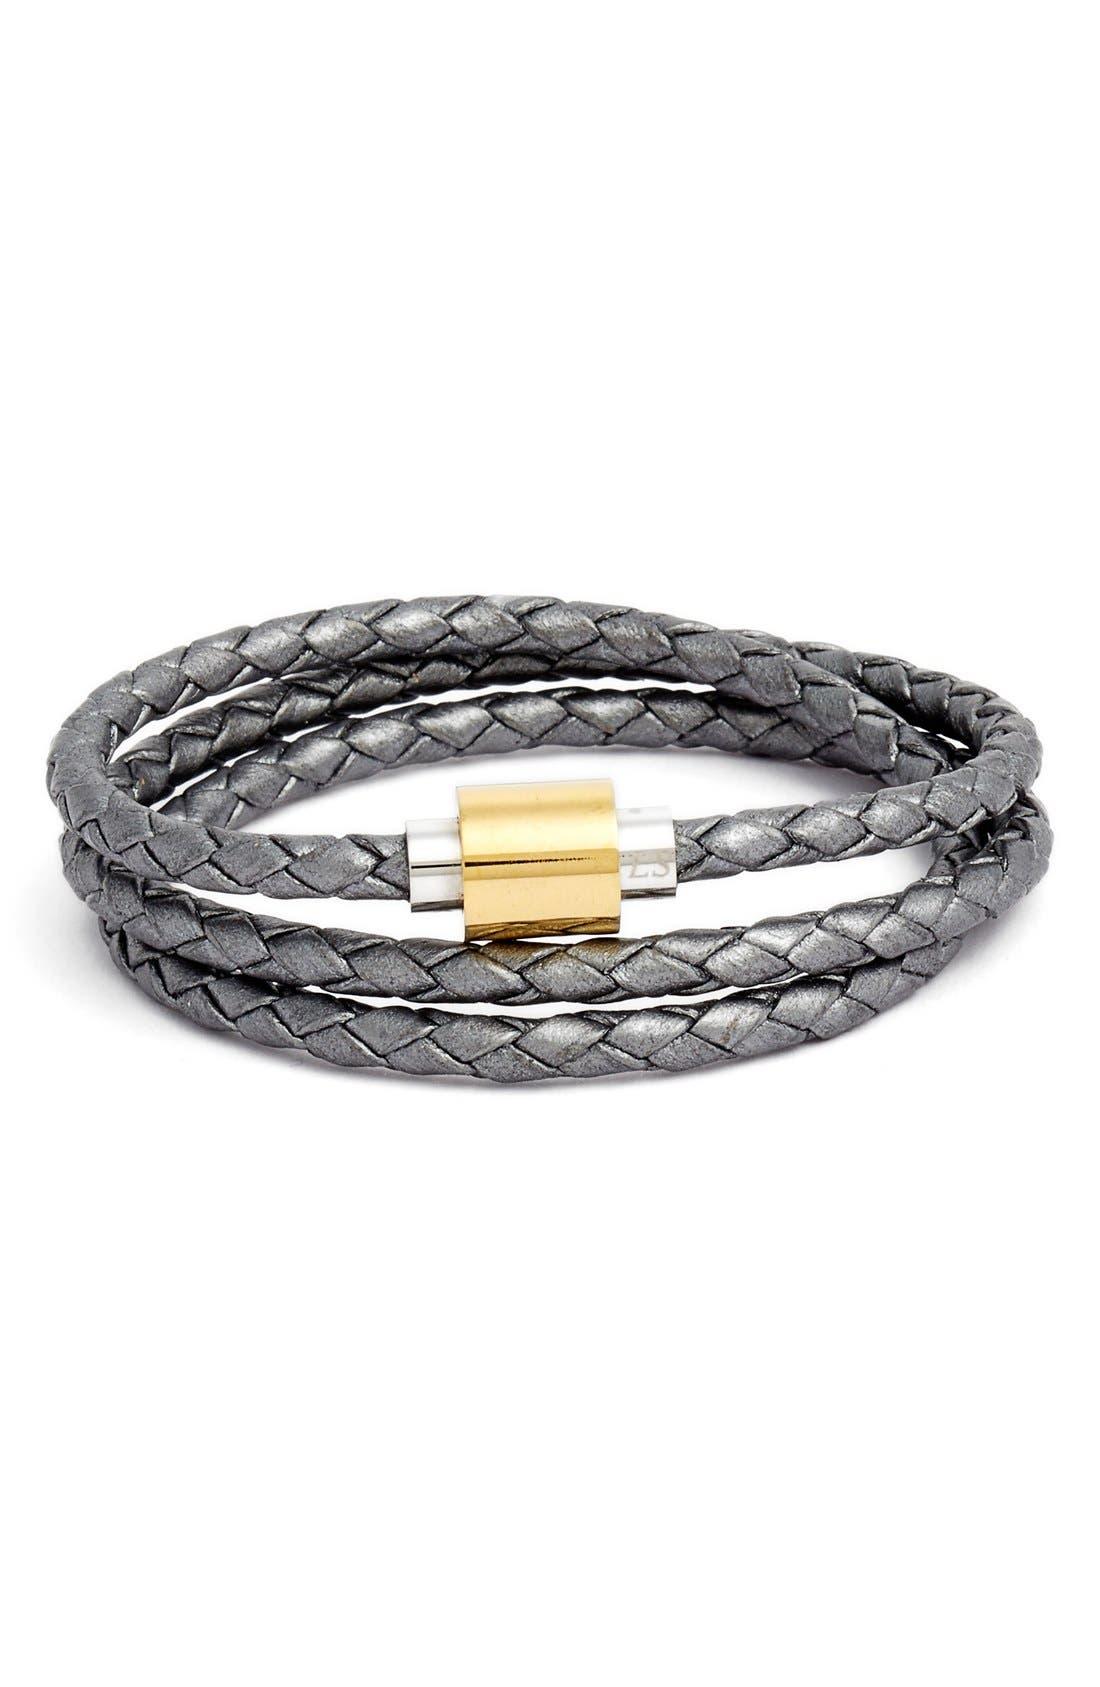 'SOBE Original' Braided Leather Wrap Bracelet,                             Main thumbnail 1, color,                             Silver